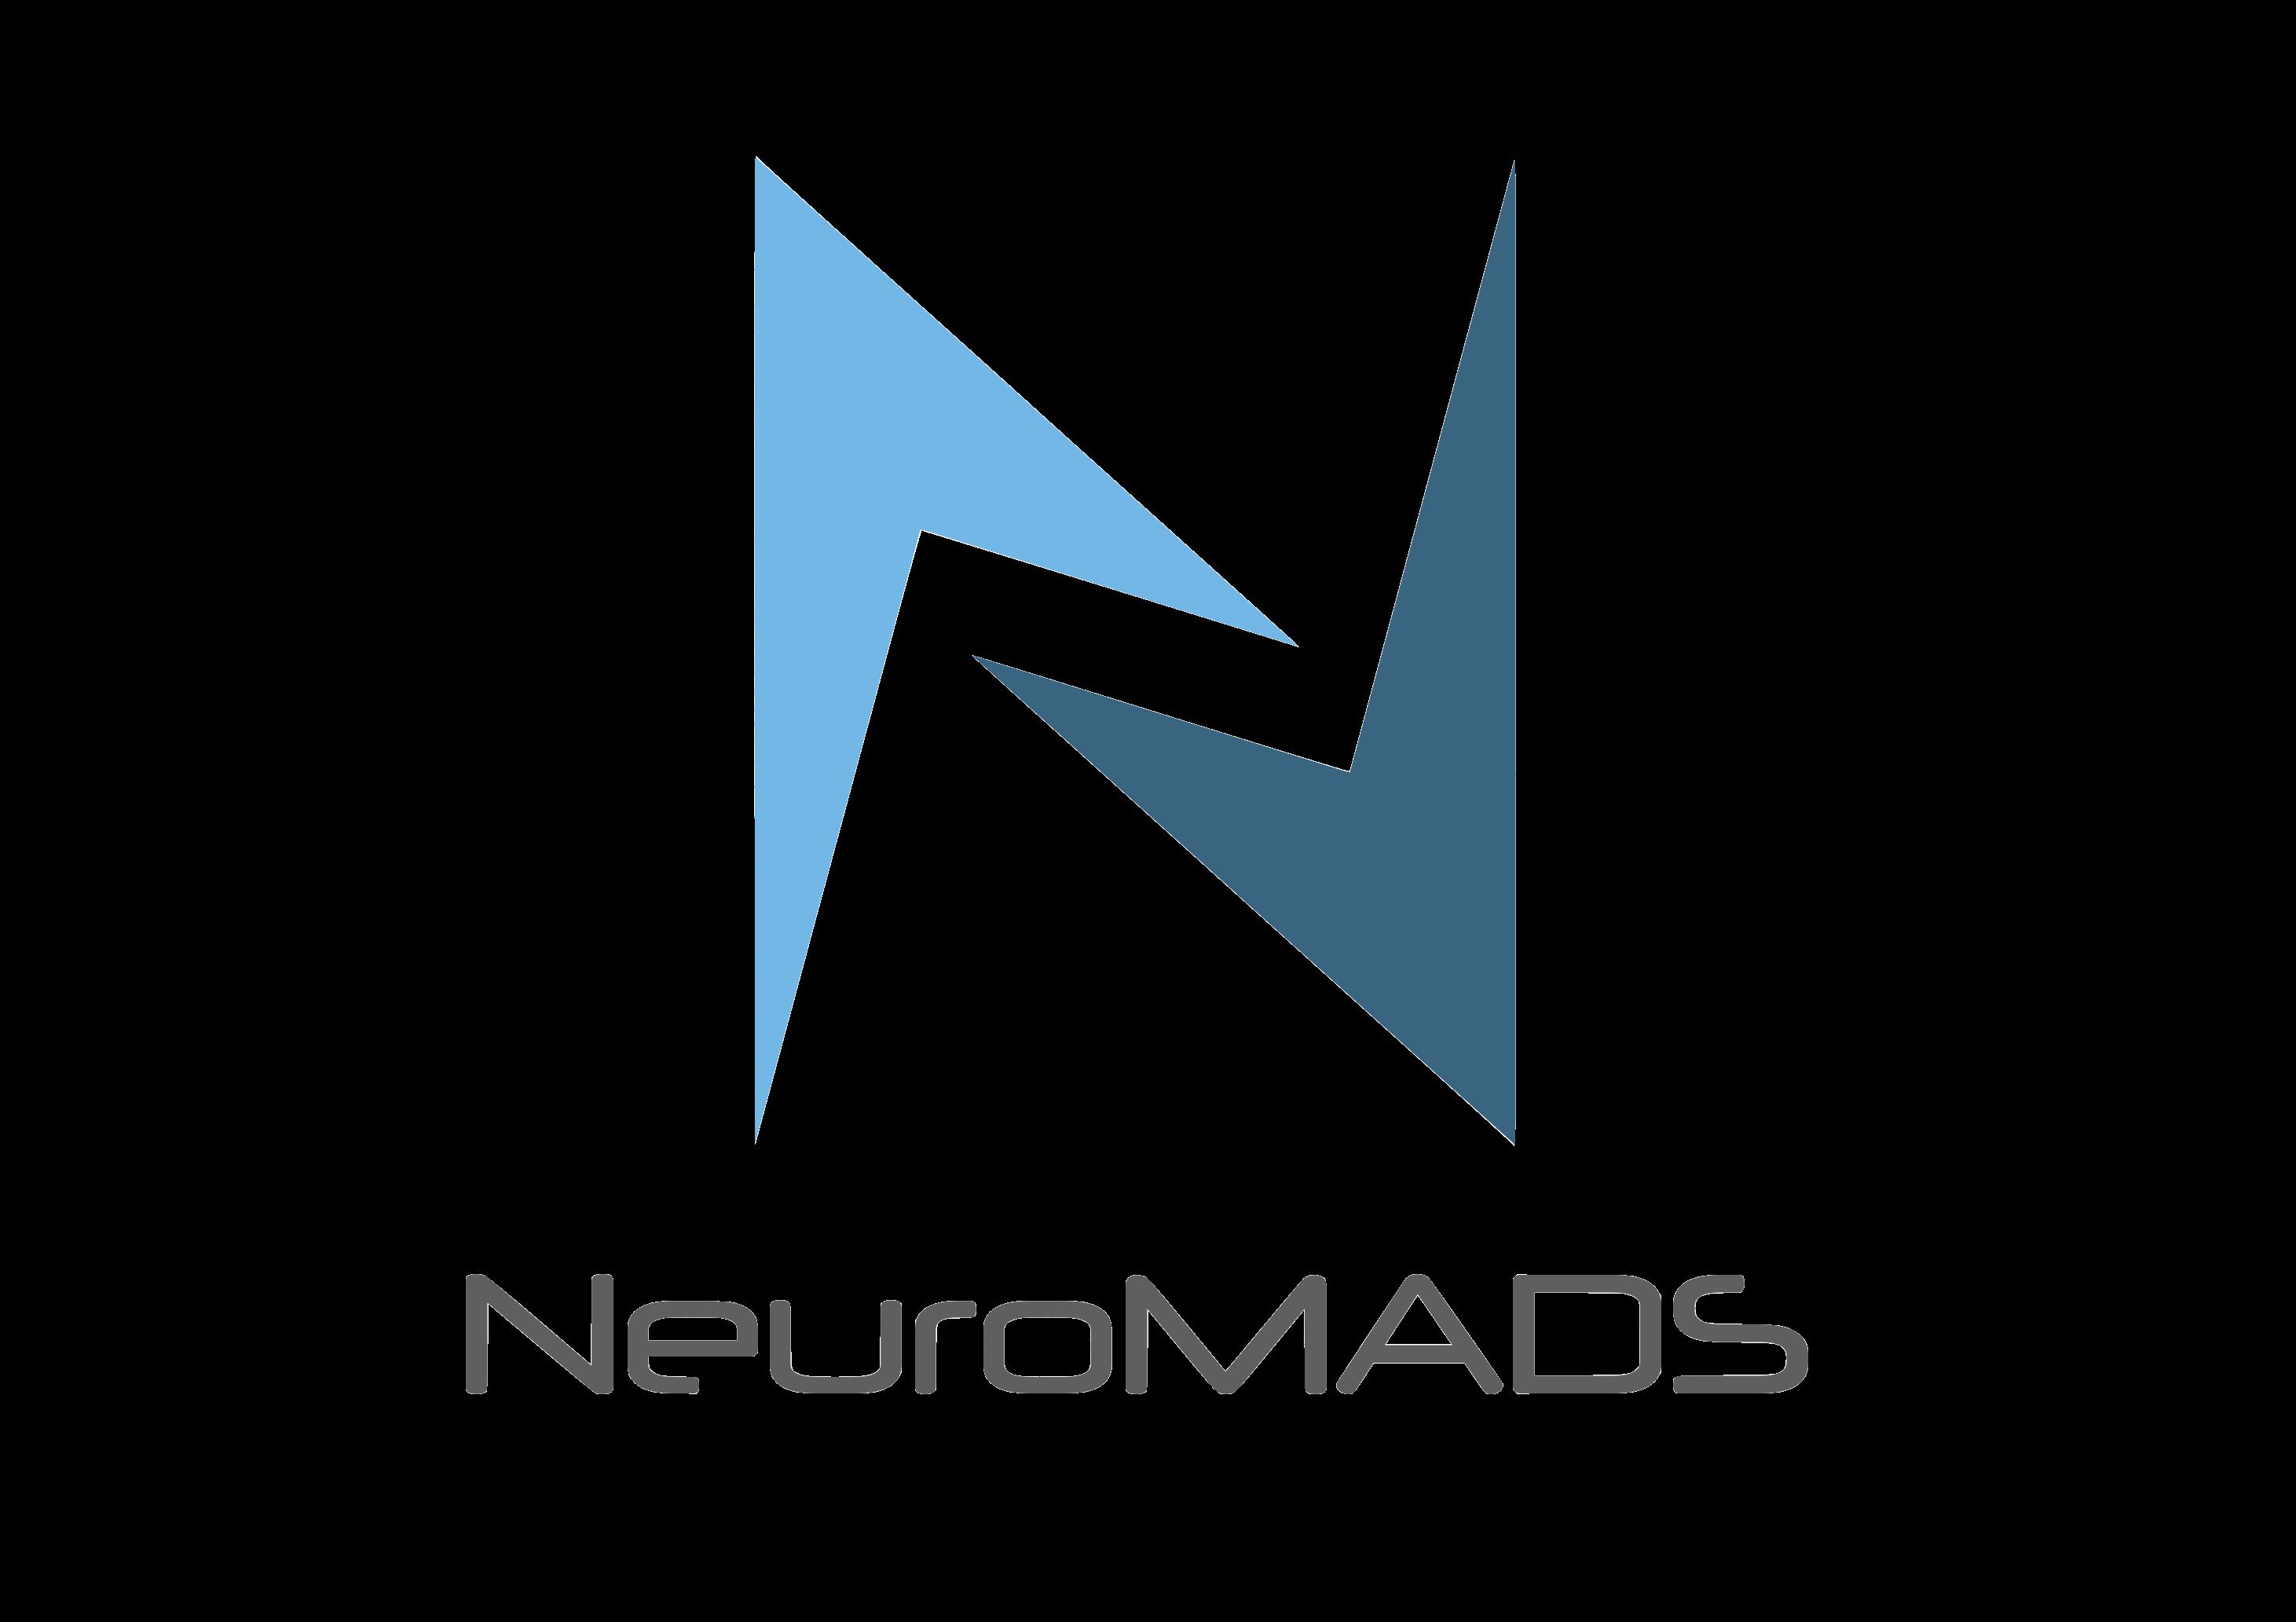 NEUROMADS